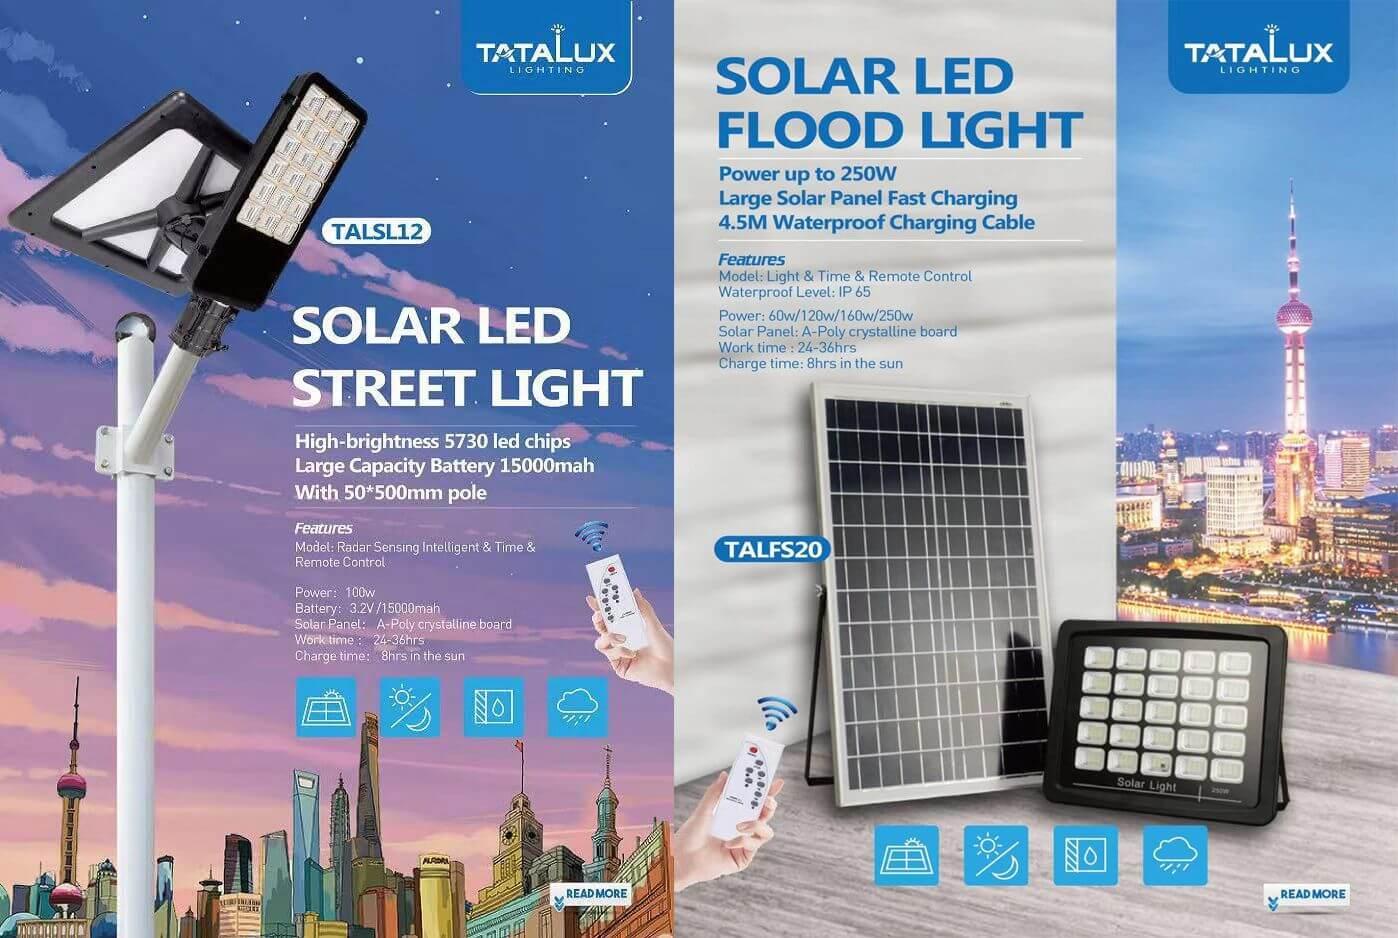 tatalux-lighting-solar-led-lighting